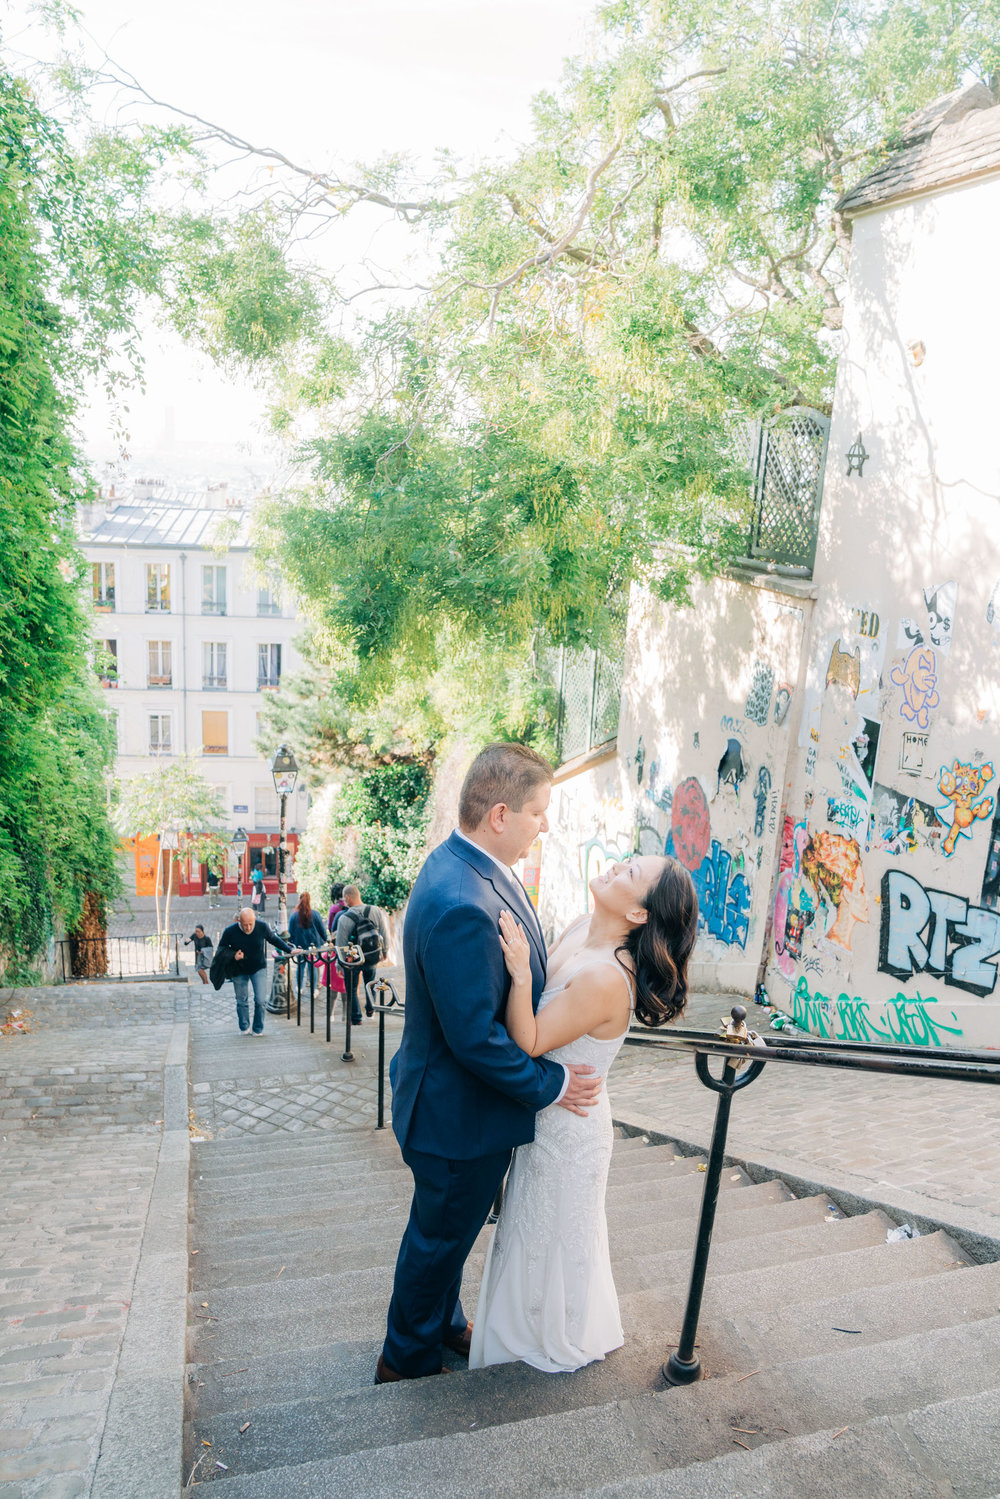 romantic wedding photo shoot in paris france montmartre neighborhood